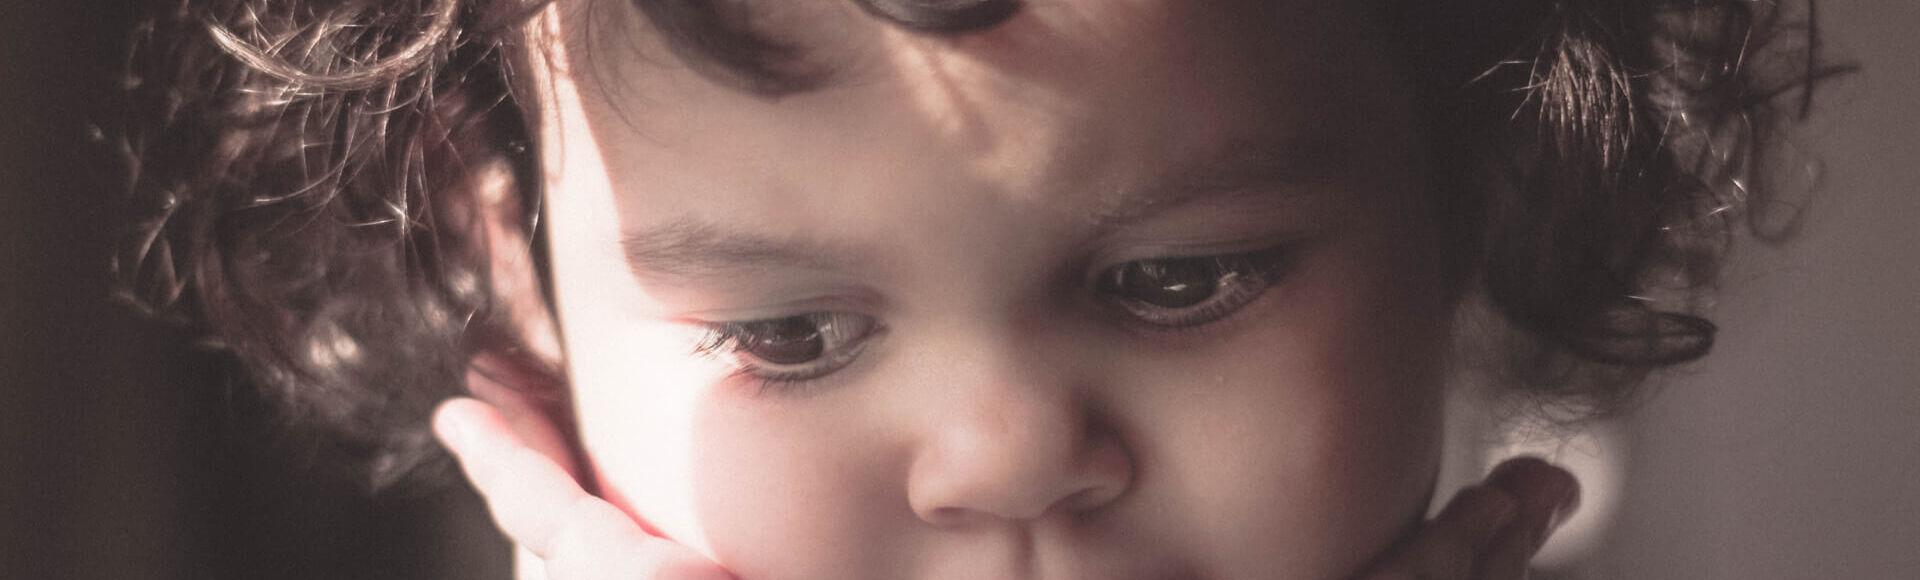 La timidez en la infancia